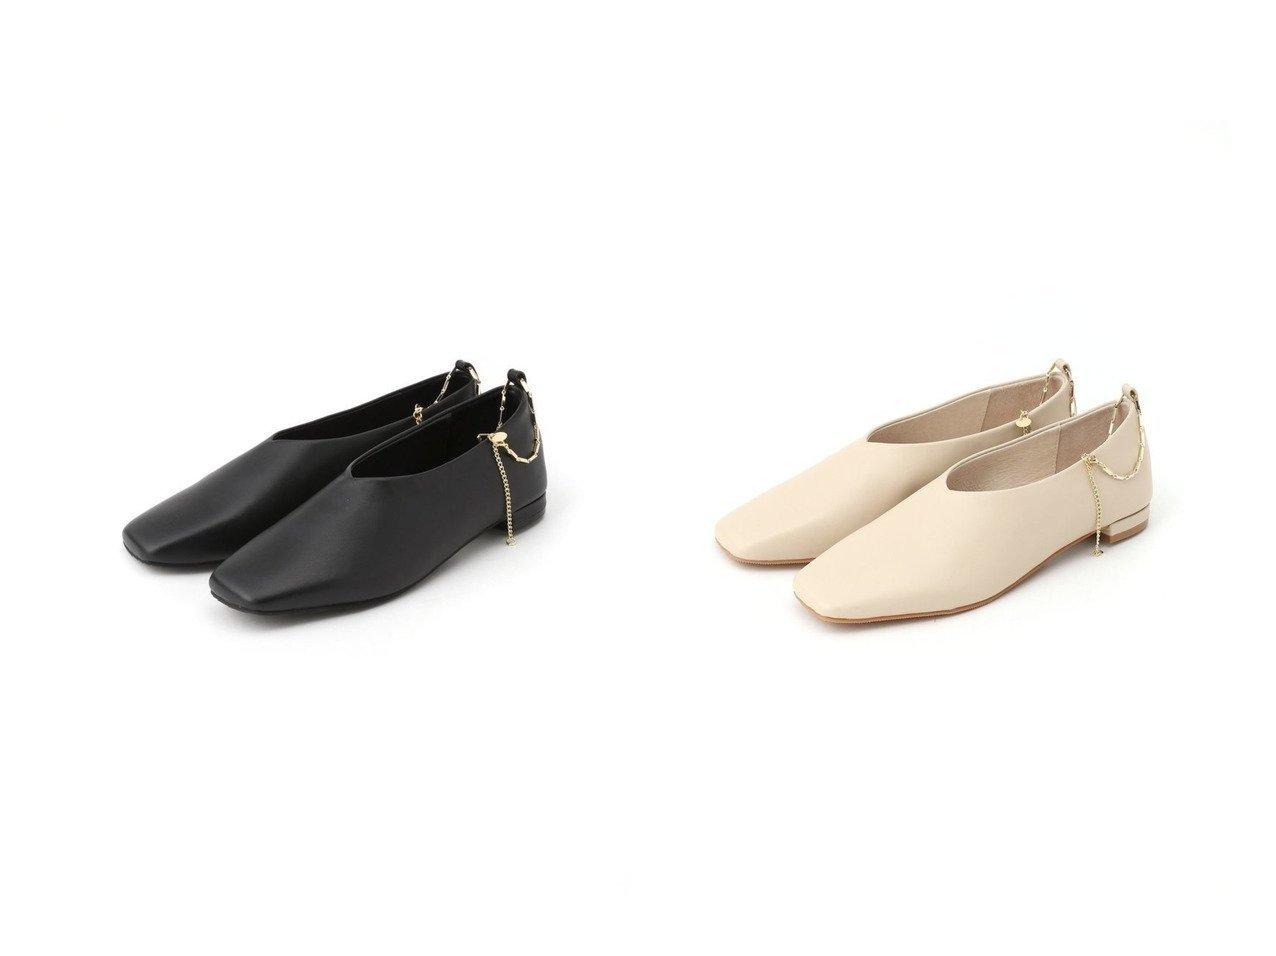 【BARNYARDSTORM/バンヤードストーム】のアンクレット付きスクエアフラット 【シューズ・靴】おすすめ!人気、トレンド・レディースファッションの通販   | レディースファッション・服の通販 founy(ファニー)